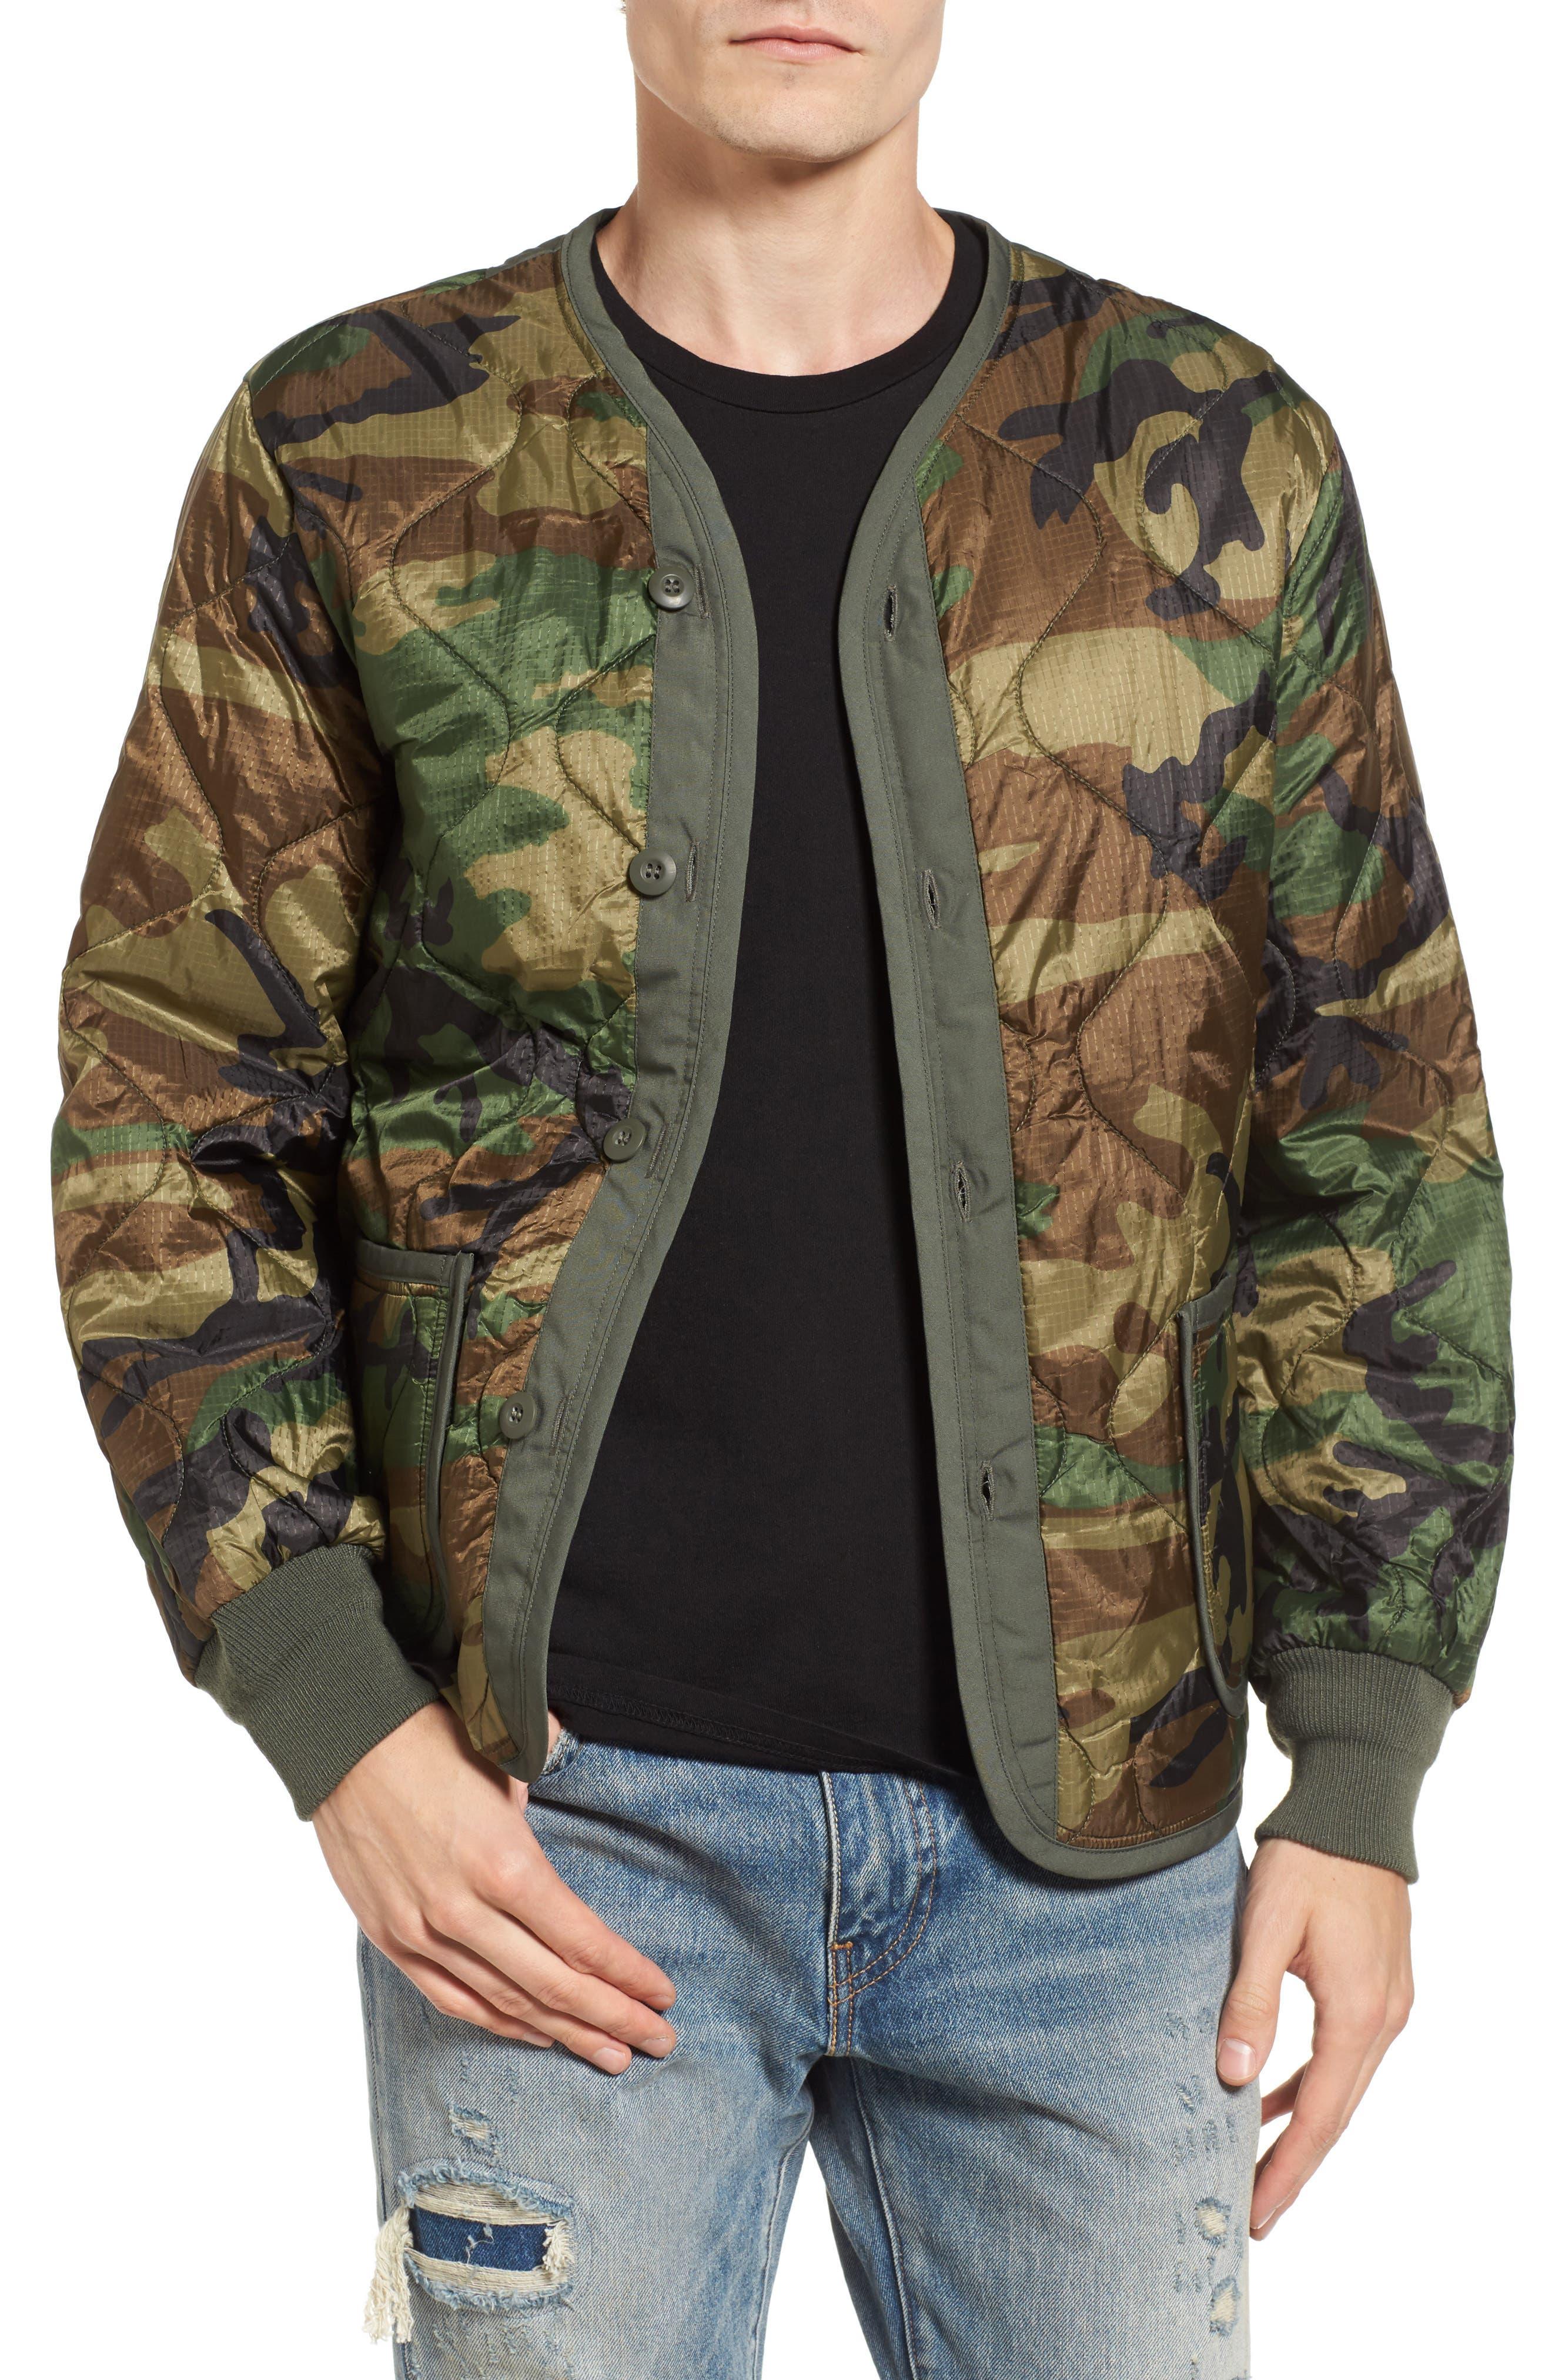 M-65 Defender Liner Jacket,                             Main thumbnail 1, color,                             Woodland Camo